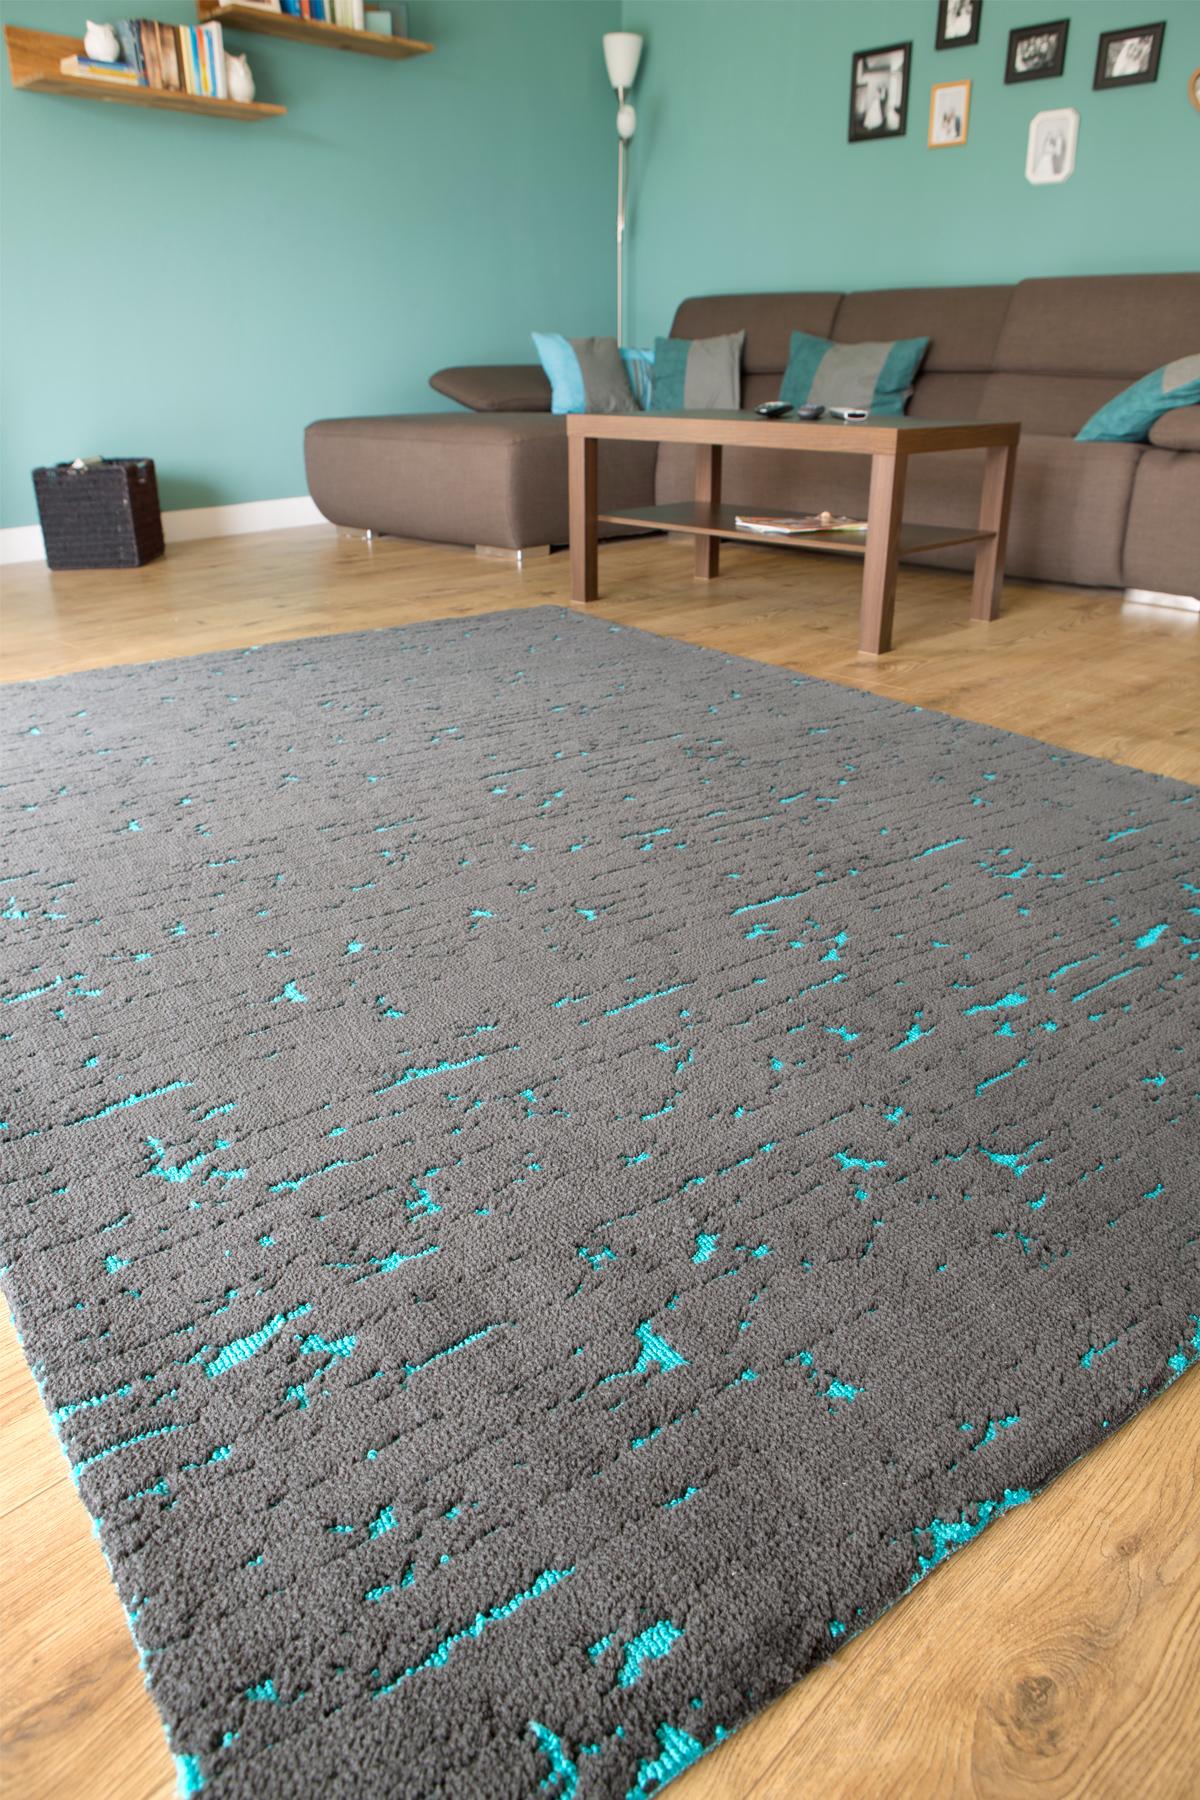 designerteppiche reinkemeier rietberg handel logistik ladenbau. Black Bedroom Furniture Sets. Home Design Ideas